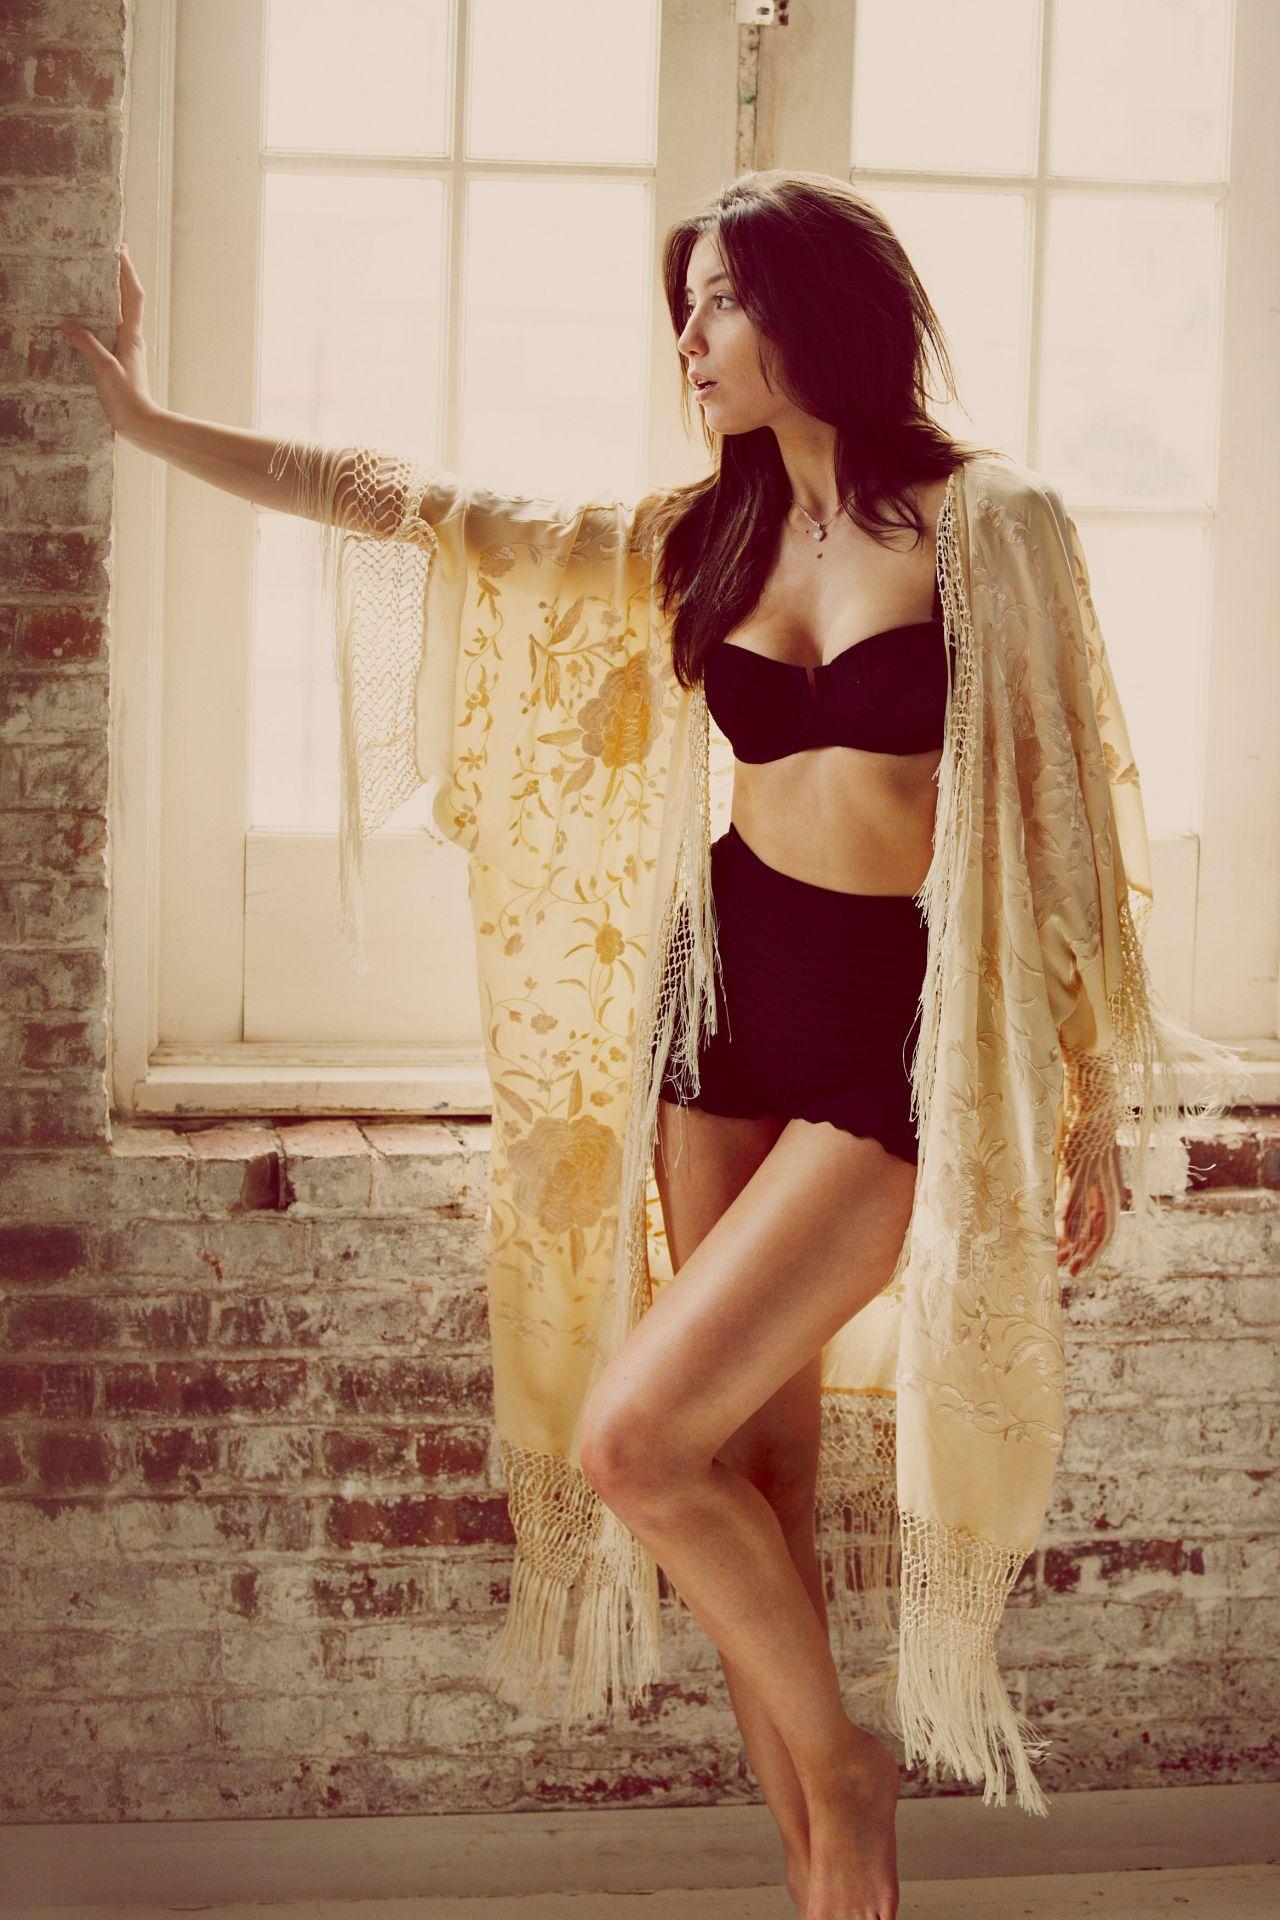 Daisy Lowe - Free People Intimates Photoshoot (2013)